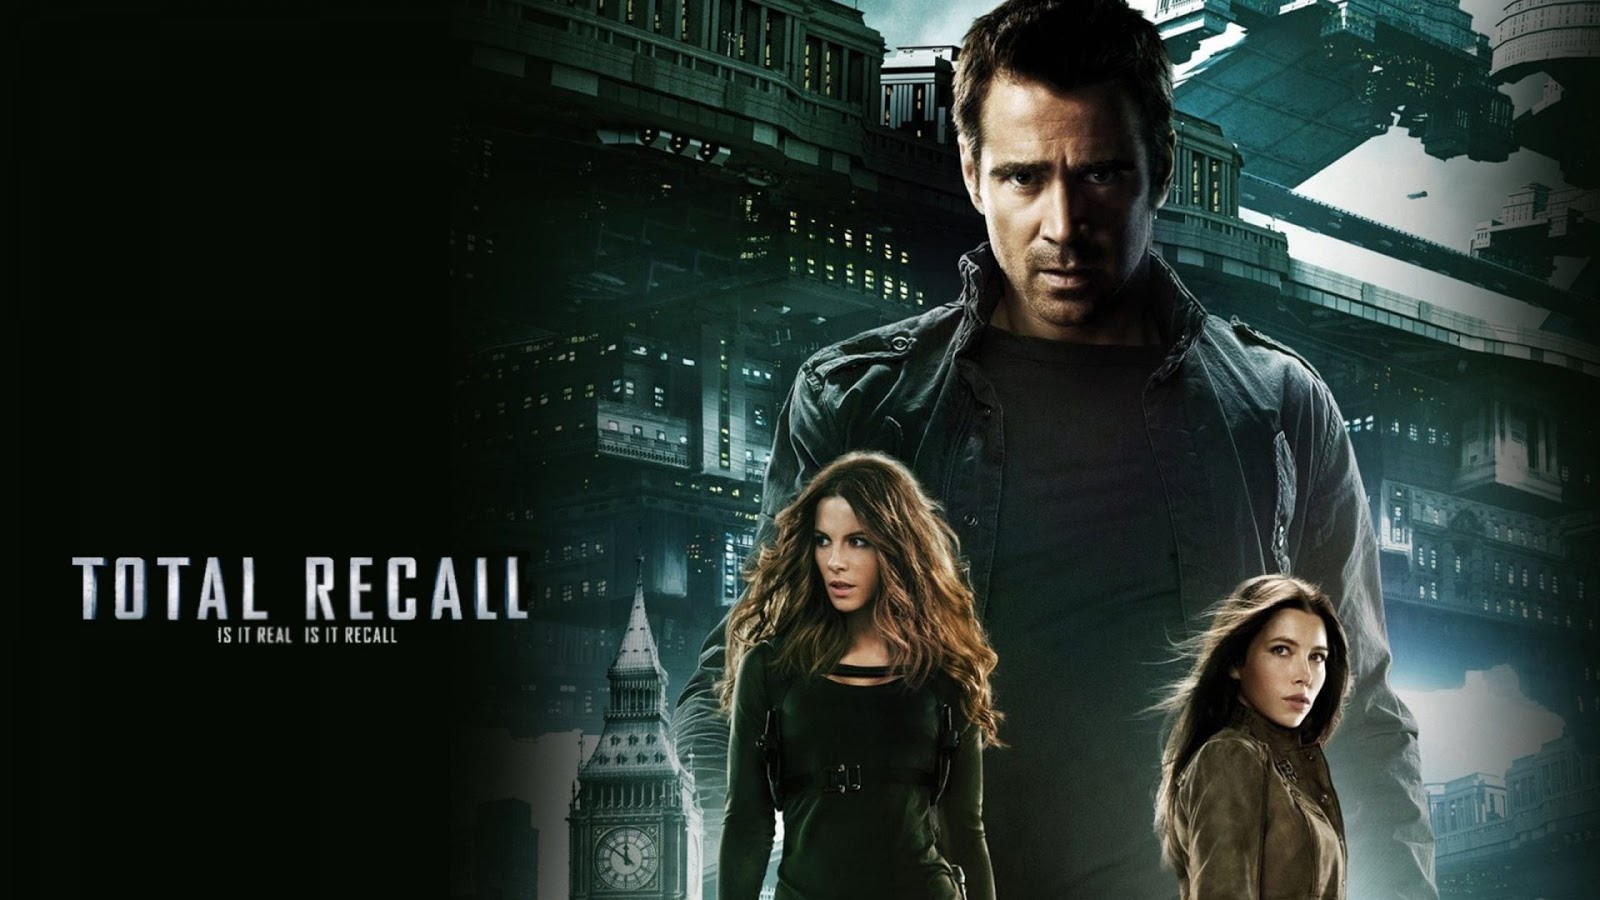 http://3.bp.blogspot.com/-Hzmd9QLpIOY/UNLVVA-hp3I/AAAAAAAAKg8/ymAKf5uO1jU/s1600/total-recall-movie-2012.jpg